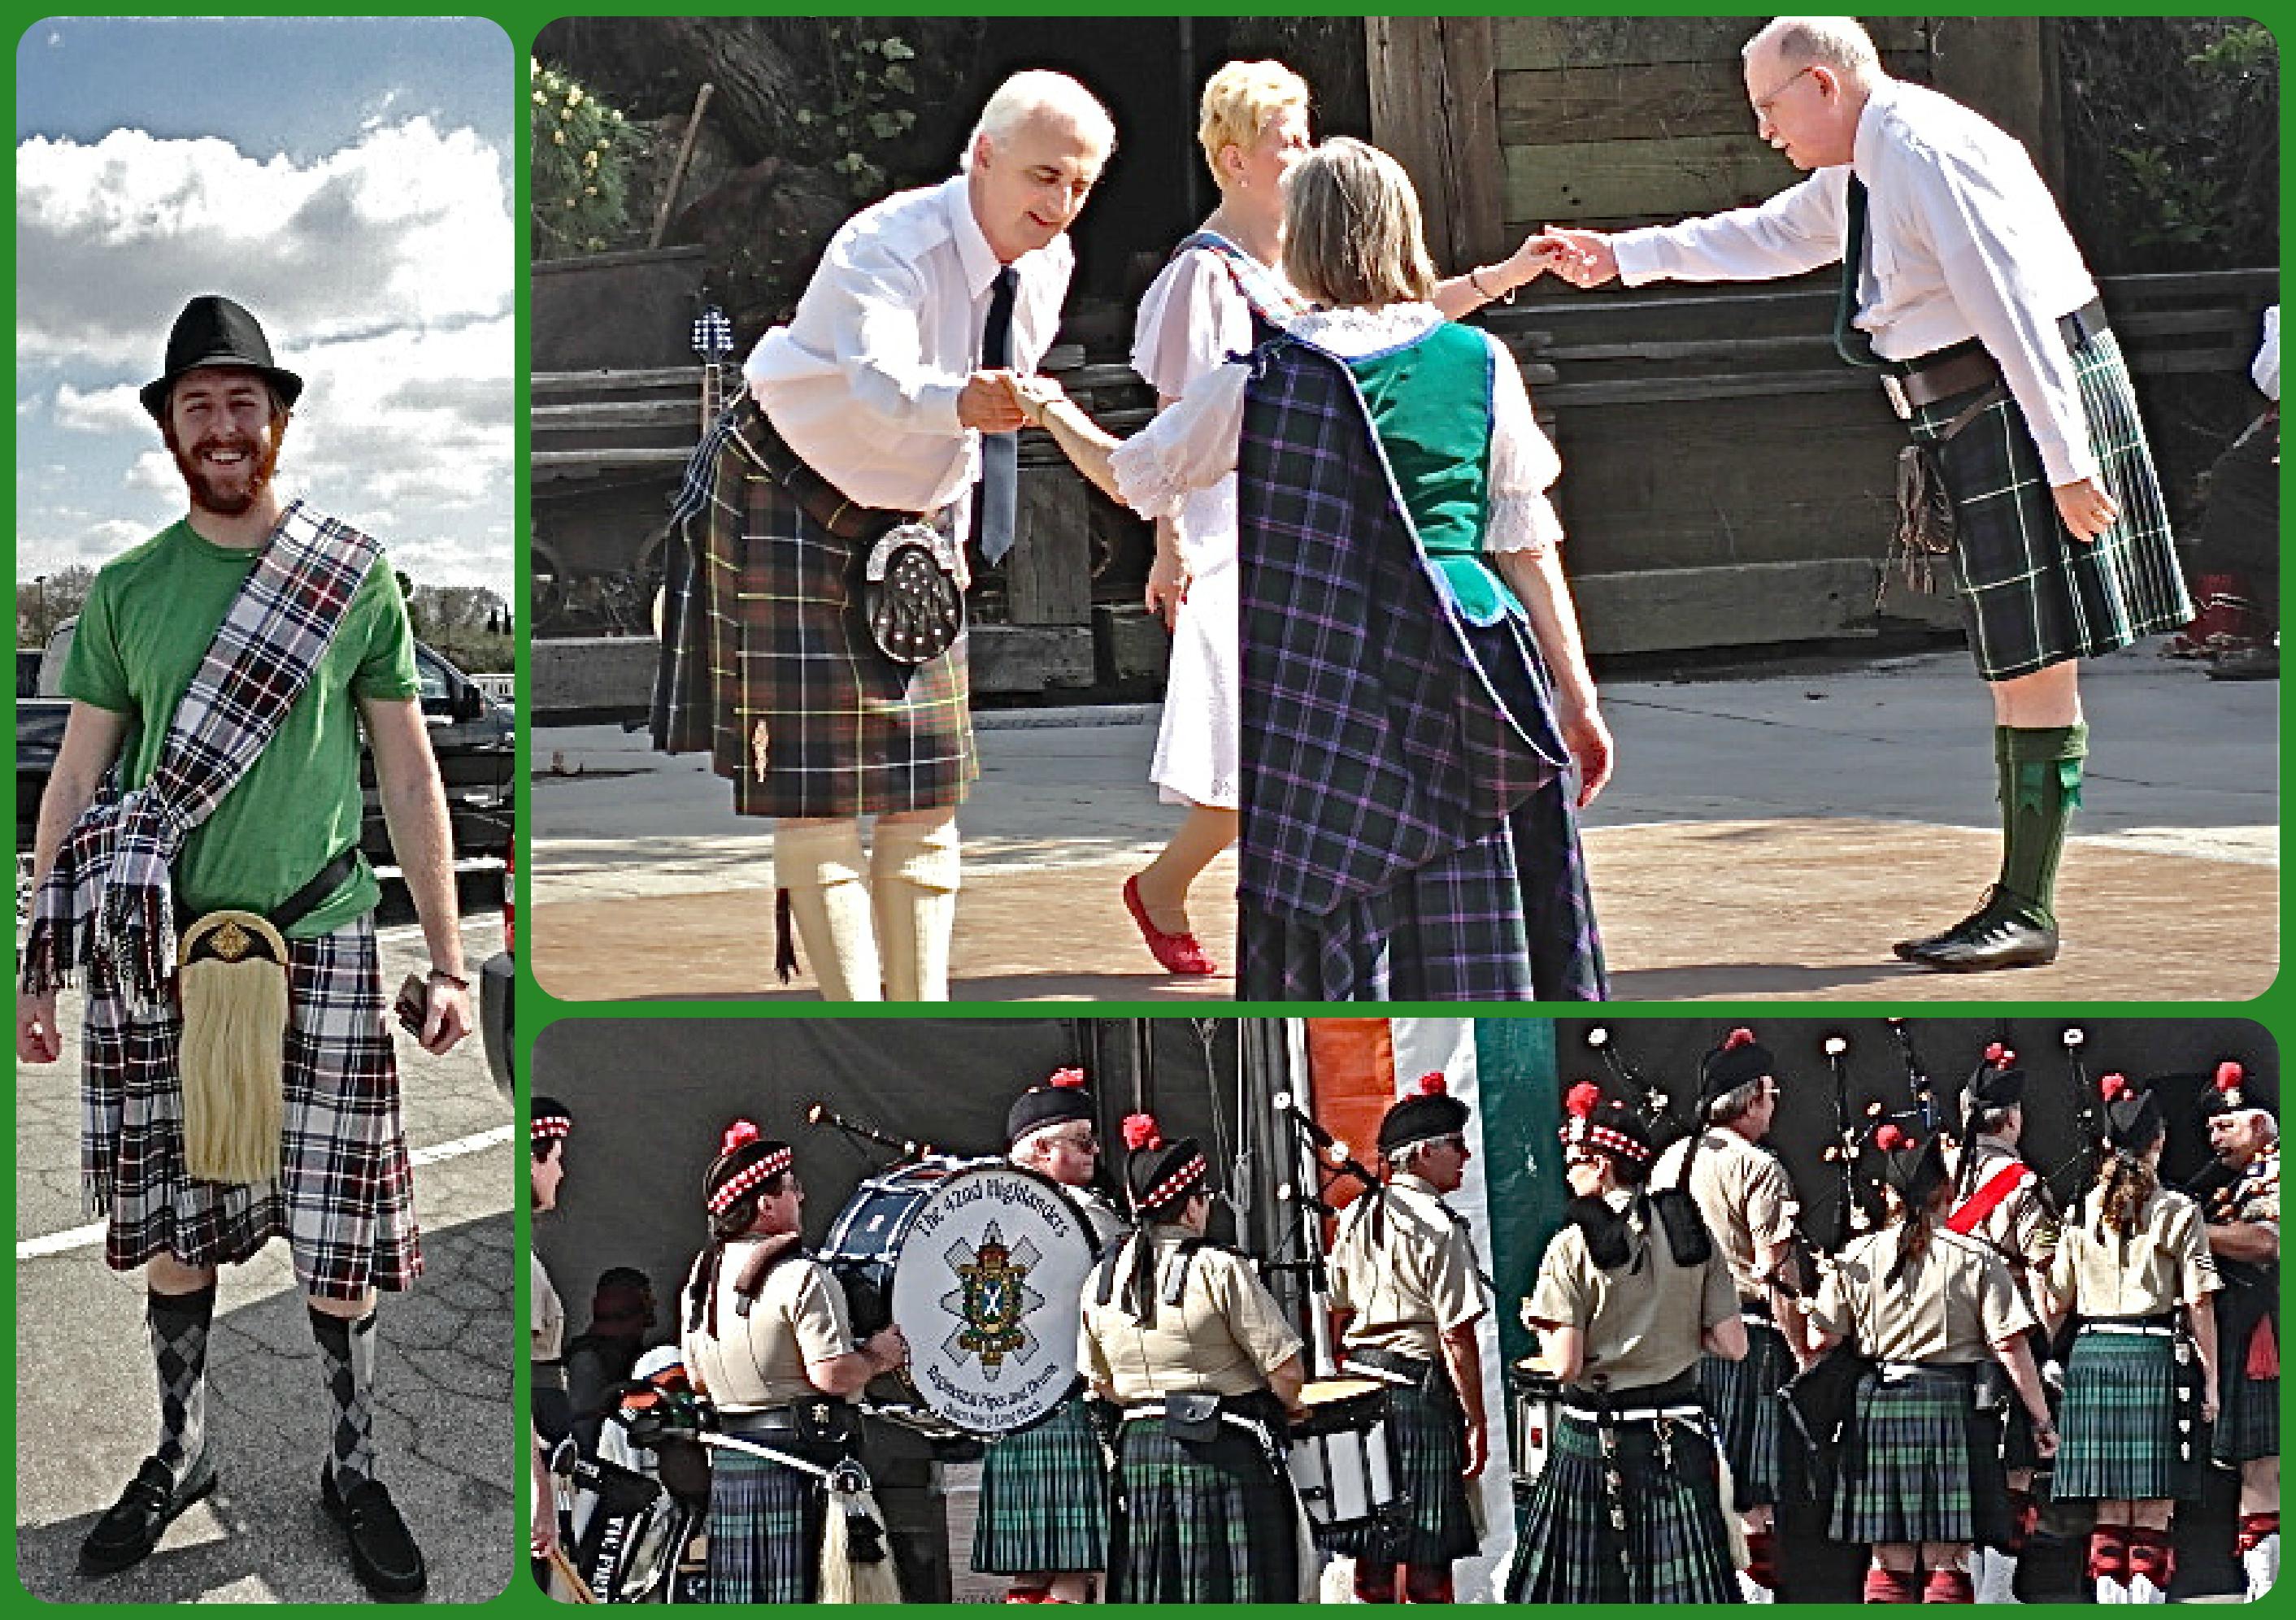 kilts, Irish dancers, bagpipes, argyle socks, Irish festival, Los Angeles County Fairgrounds, Lynn Kelley, Lynn Kelley author, St. Patrick's Day, http://lynnkelleyauthor.wordpress.com